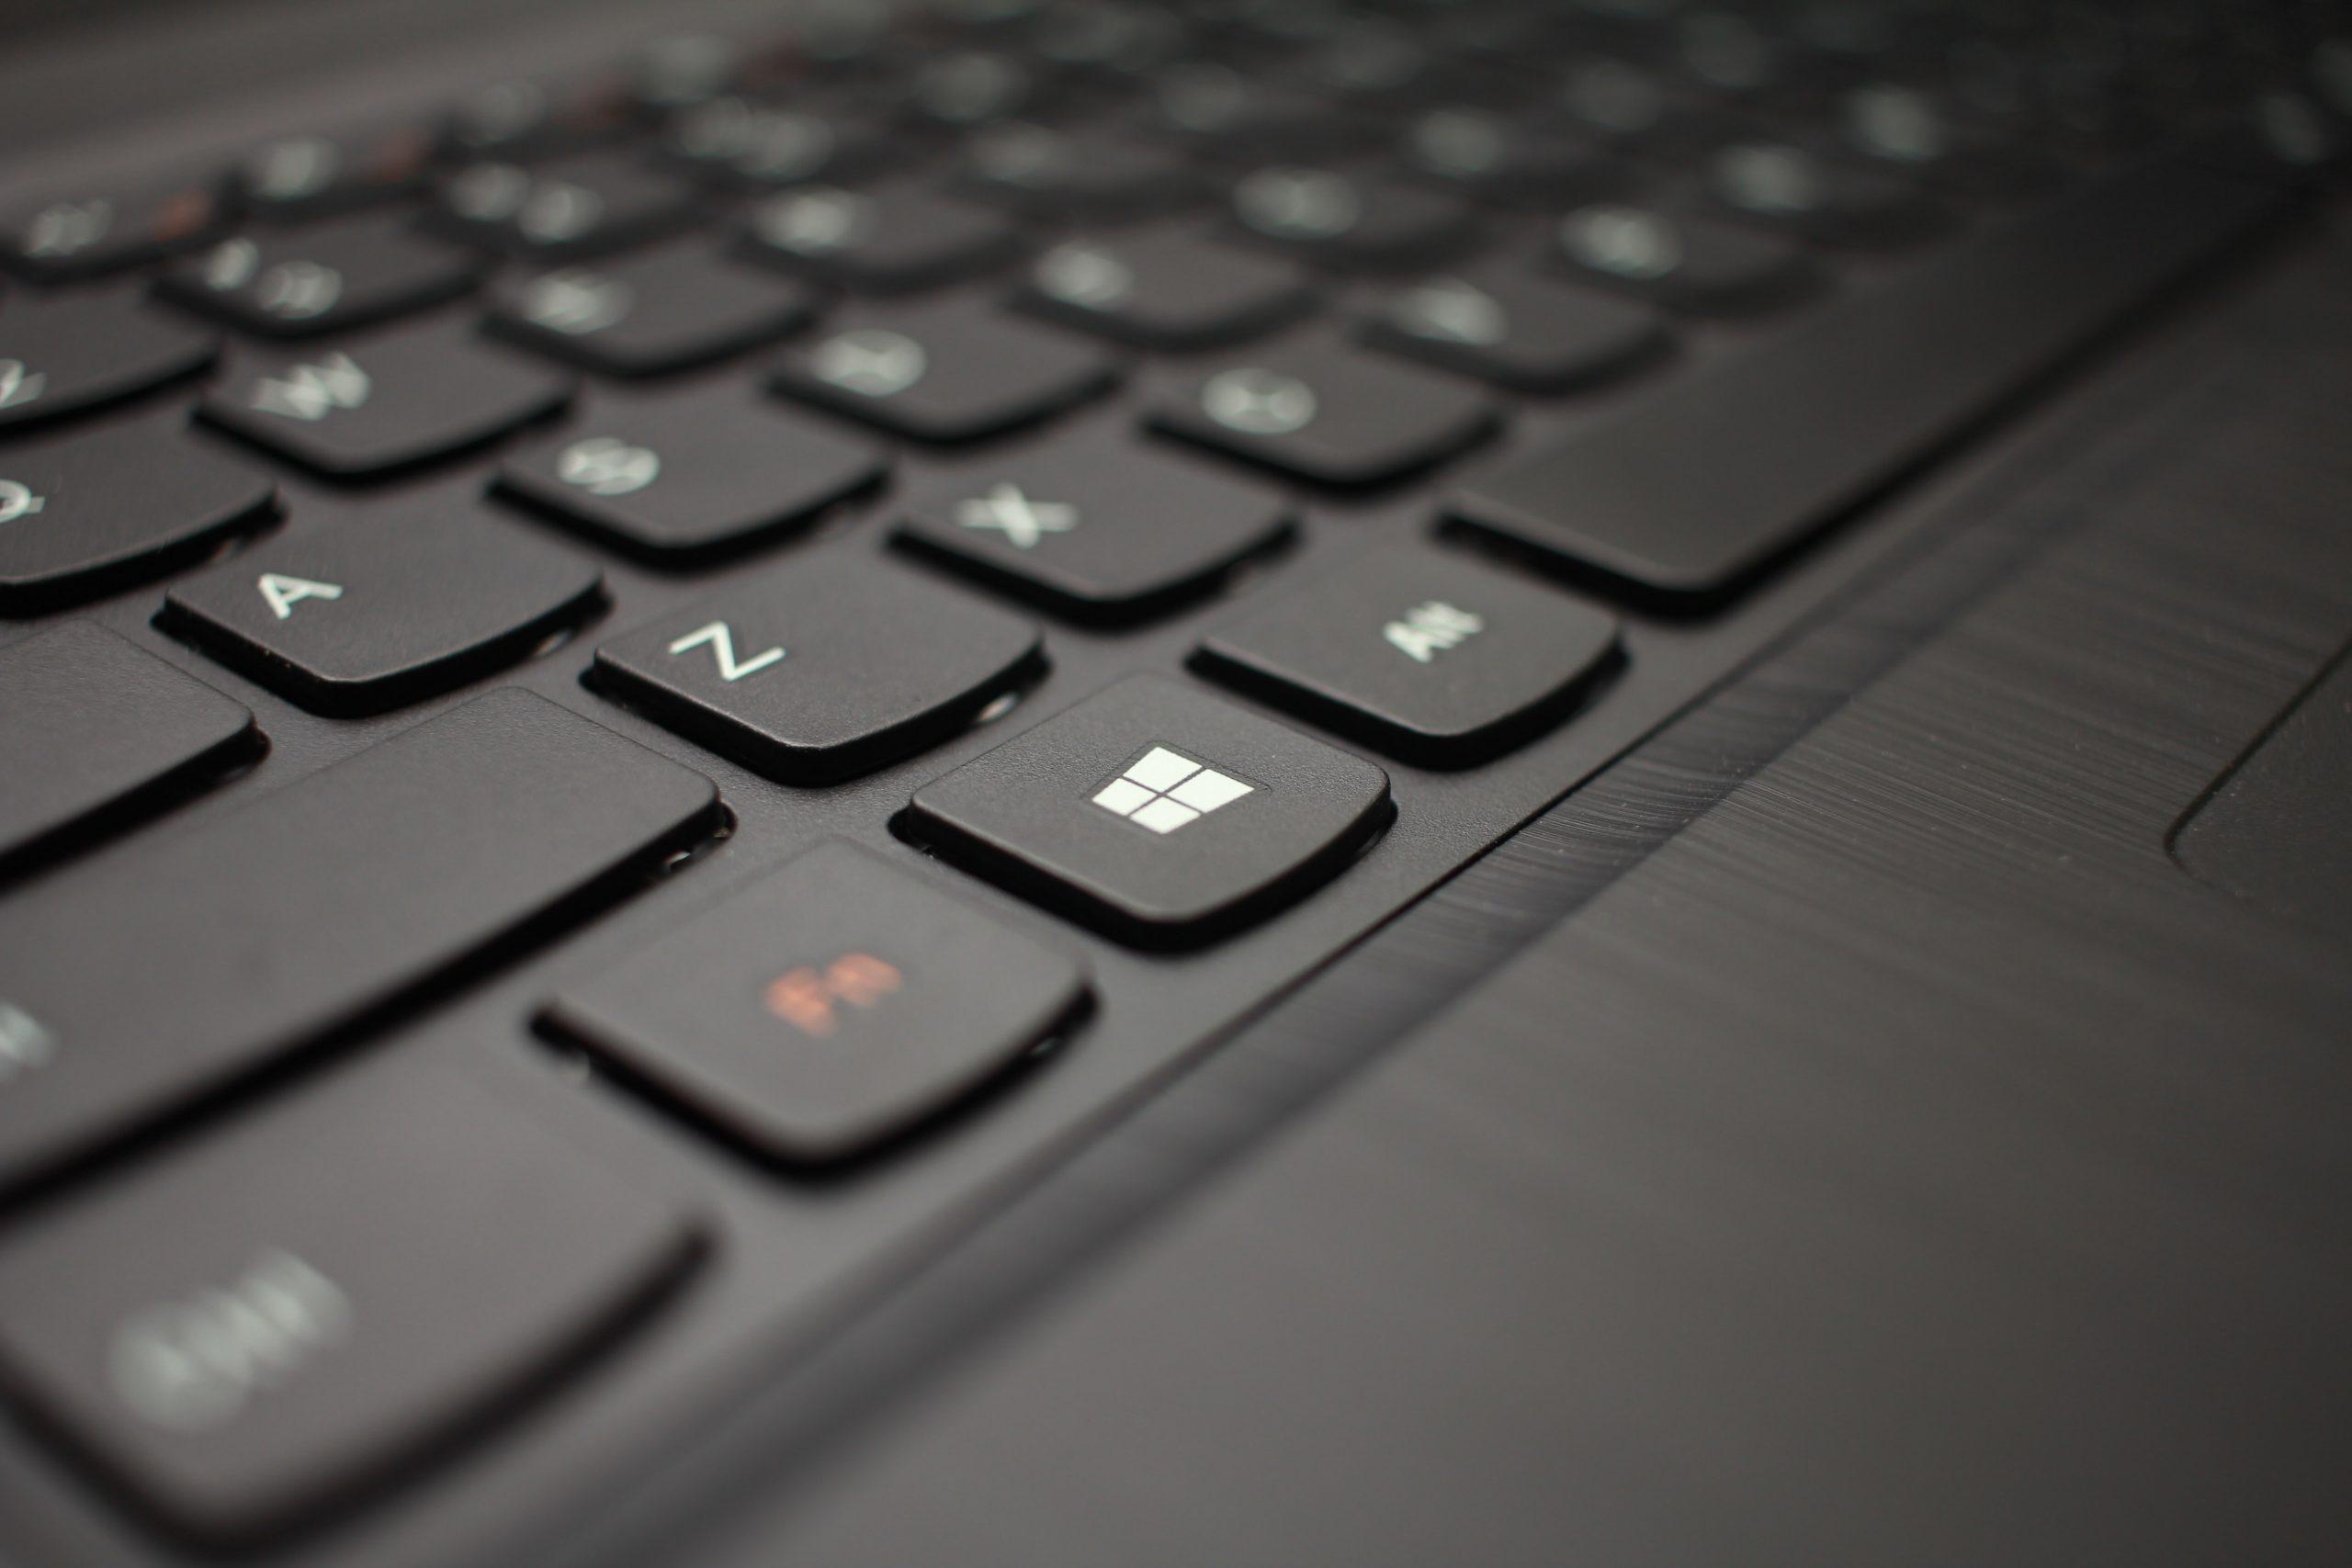 Windows Keyword Shortcuts